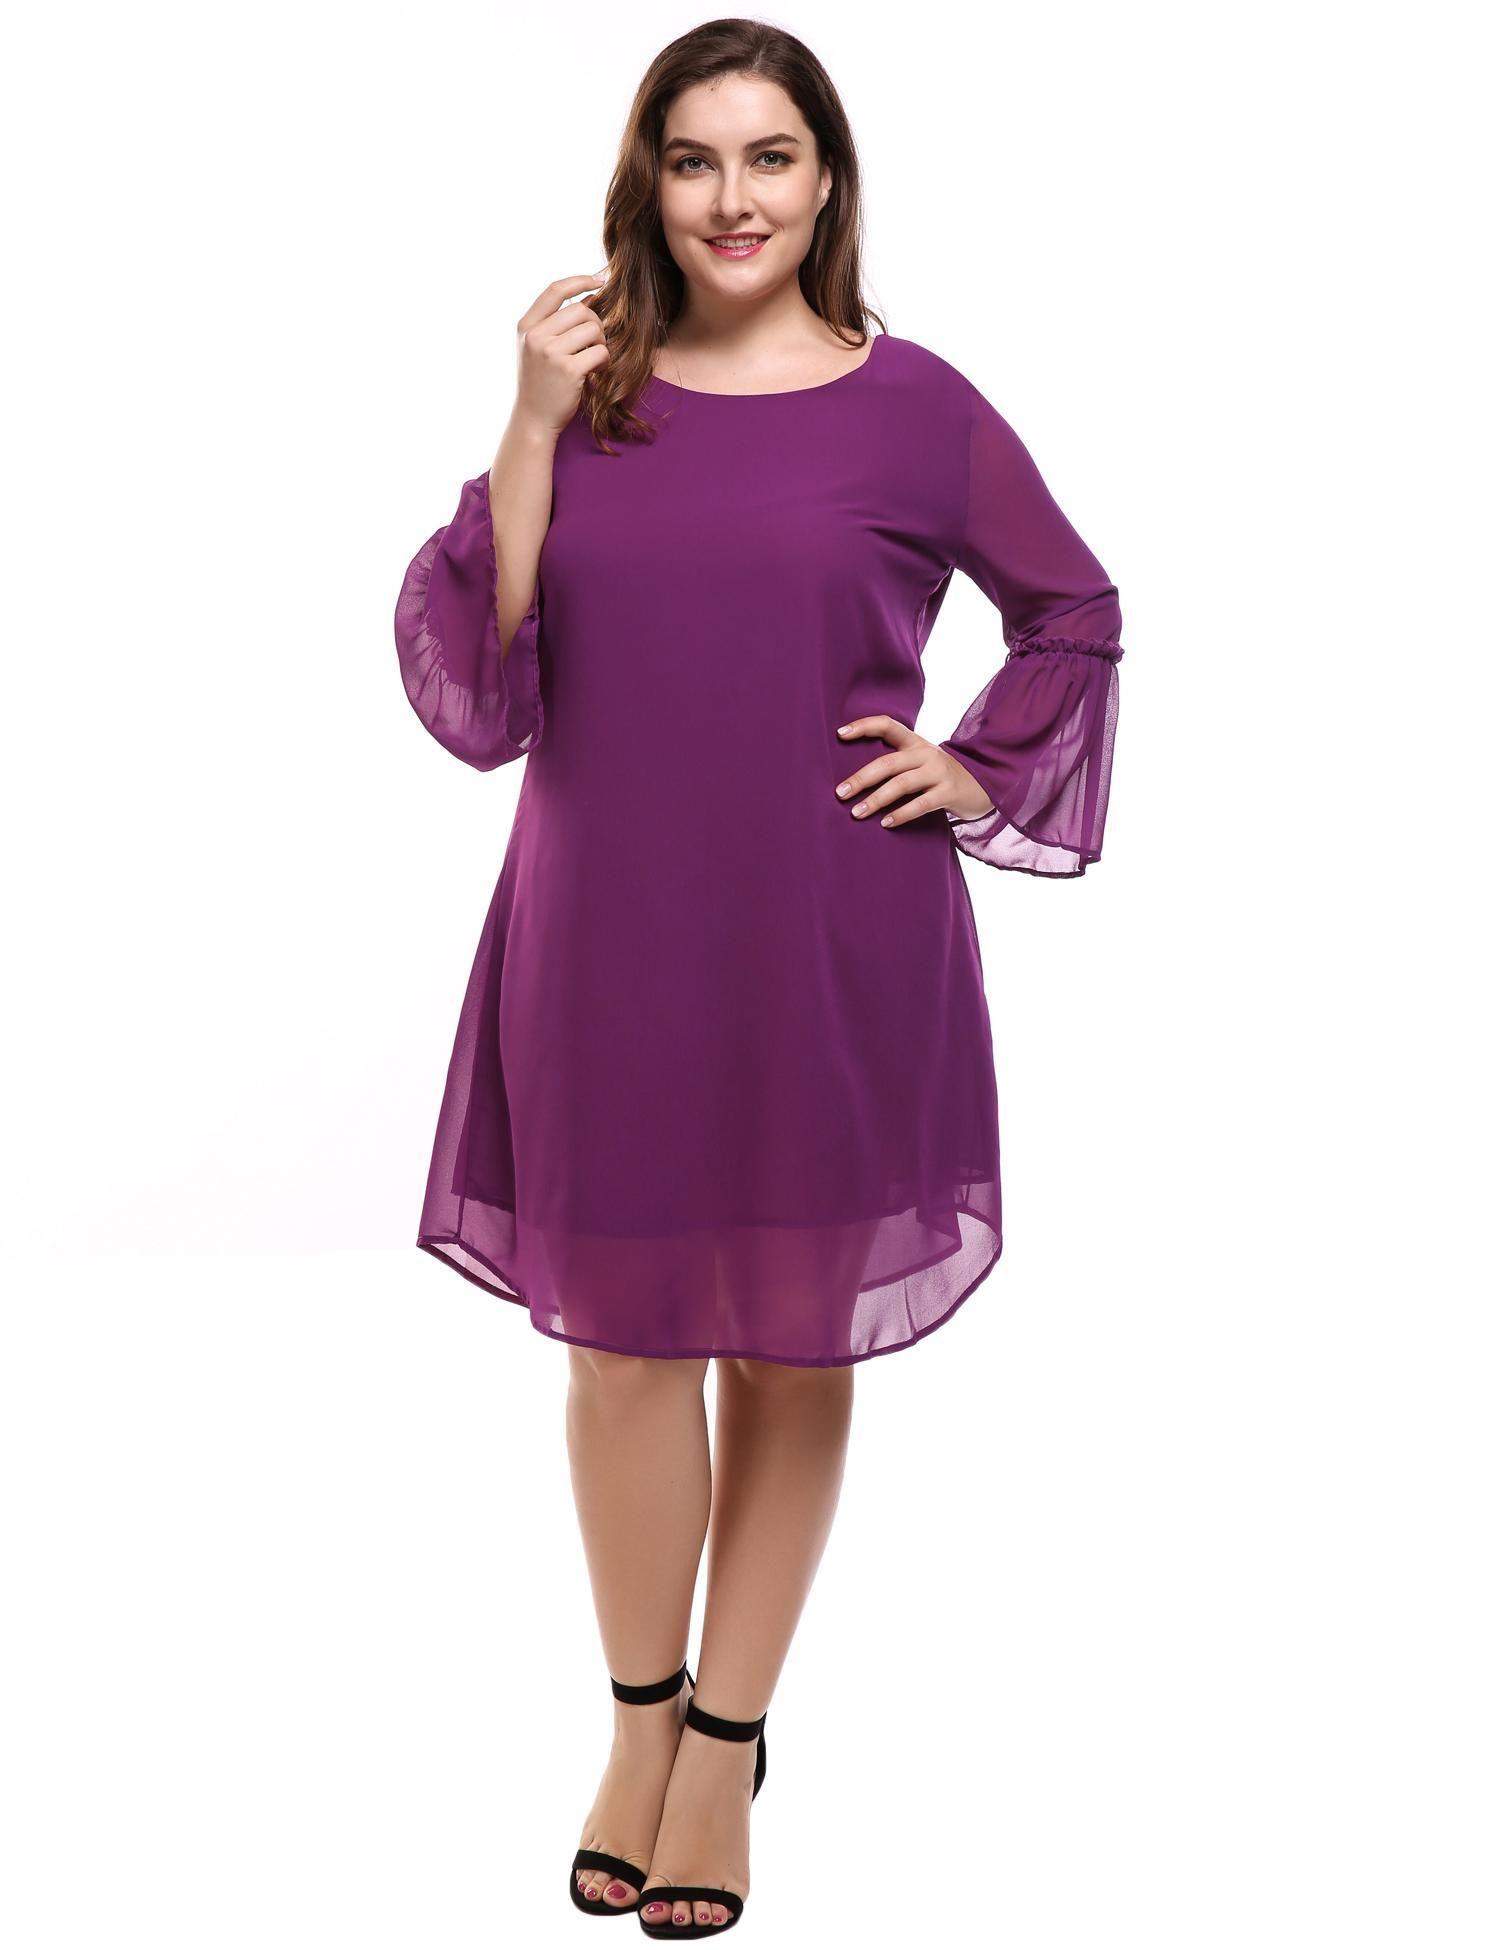 Plus Size Women\'s Flare Sleeve Casual Loose Chiffon A-Line Dress CYBST